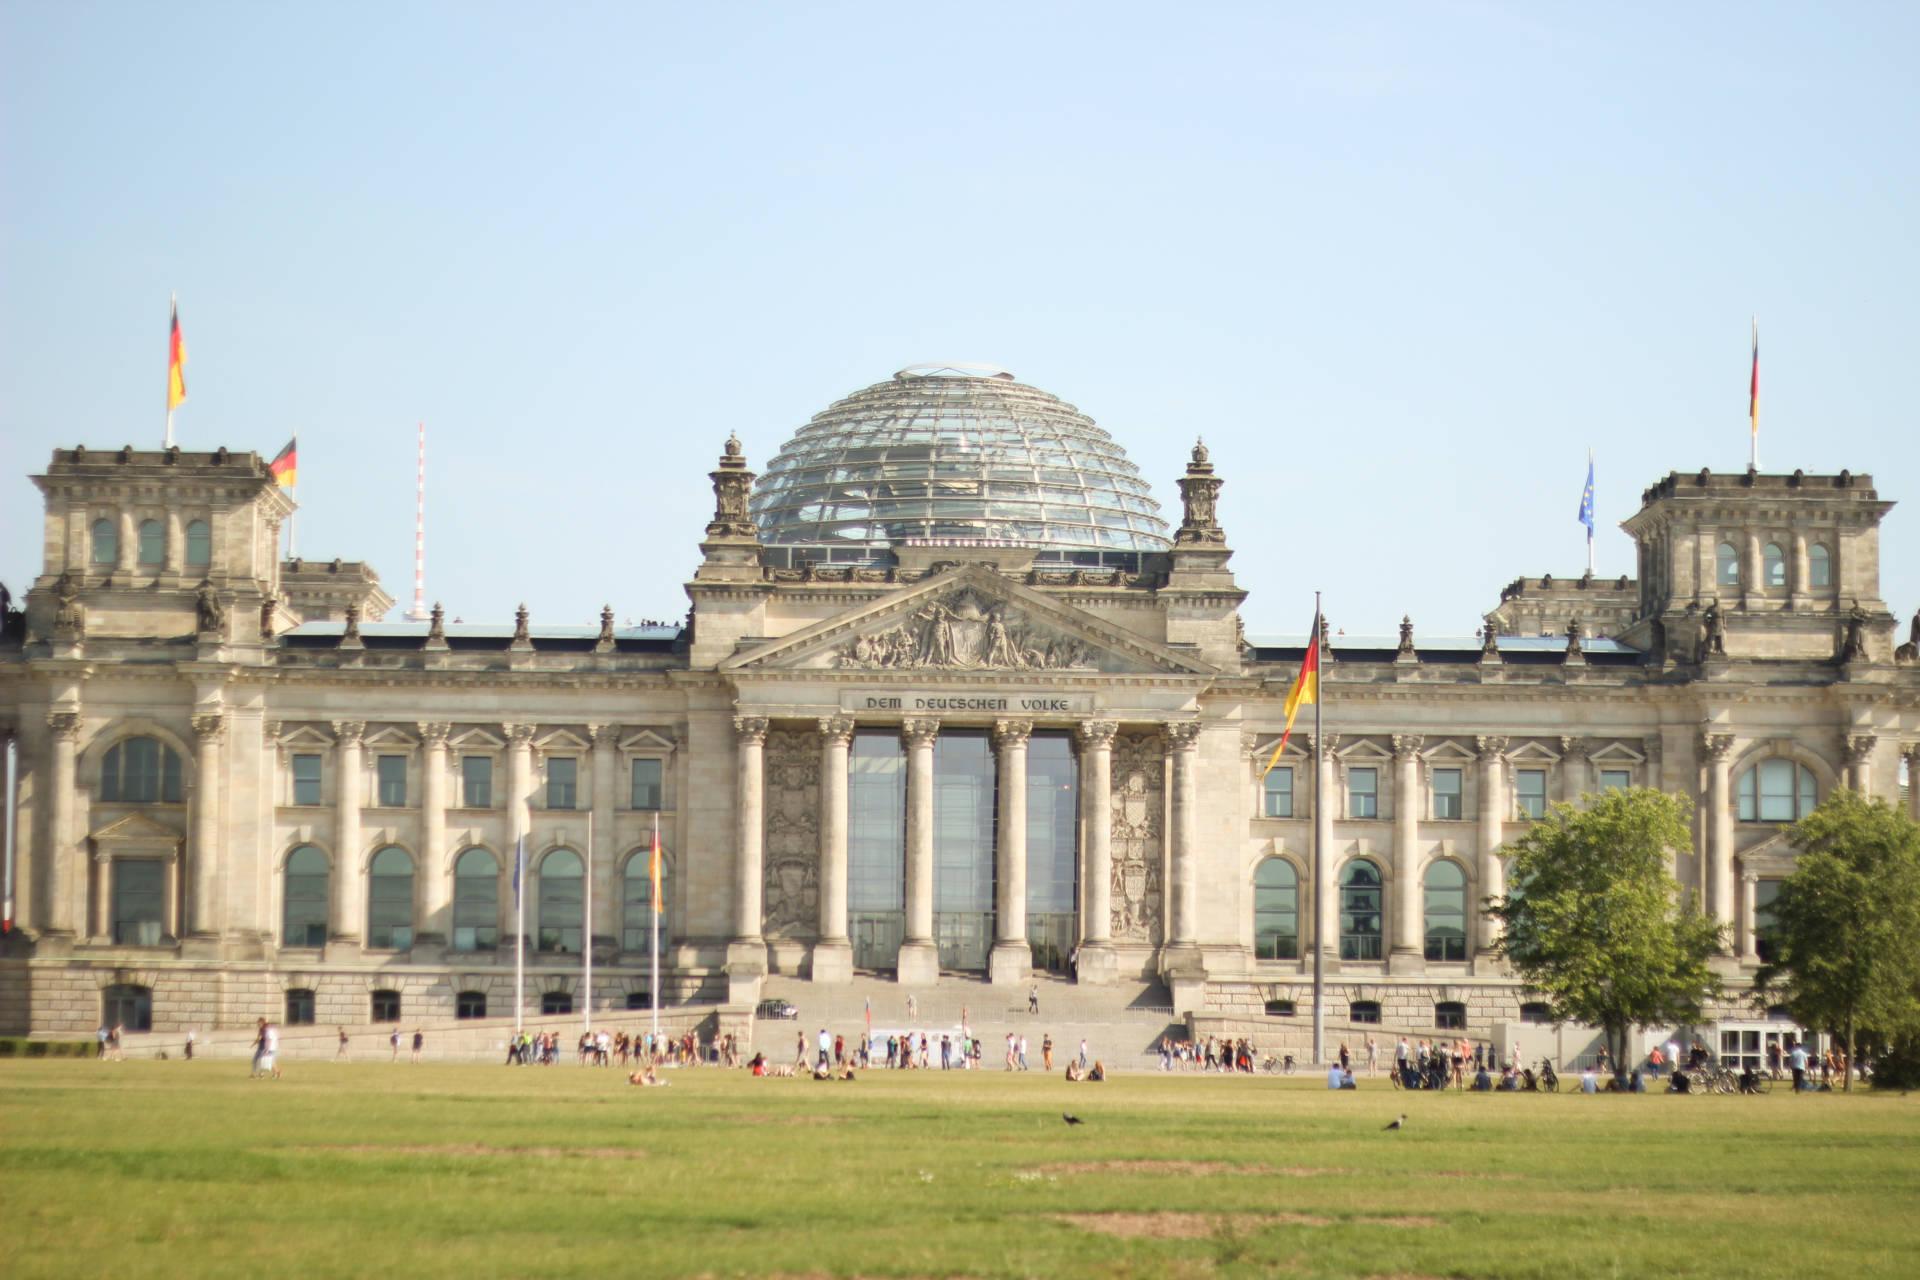 Berlin photo diary